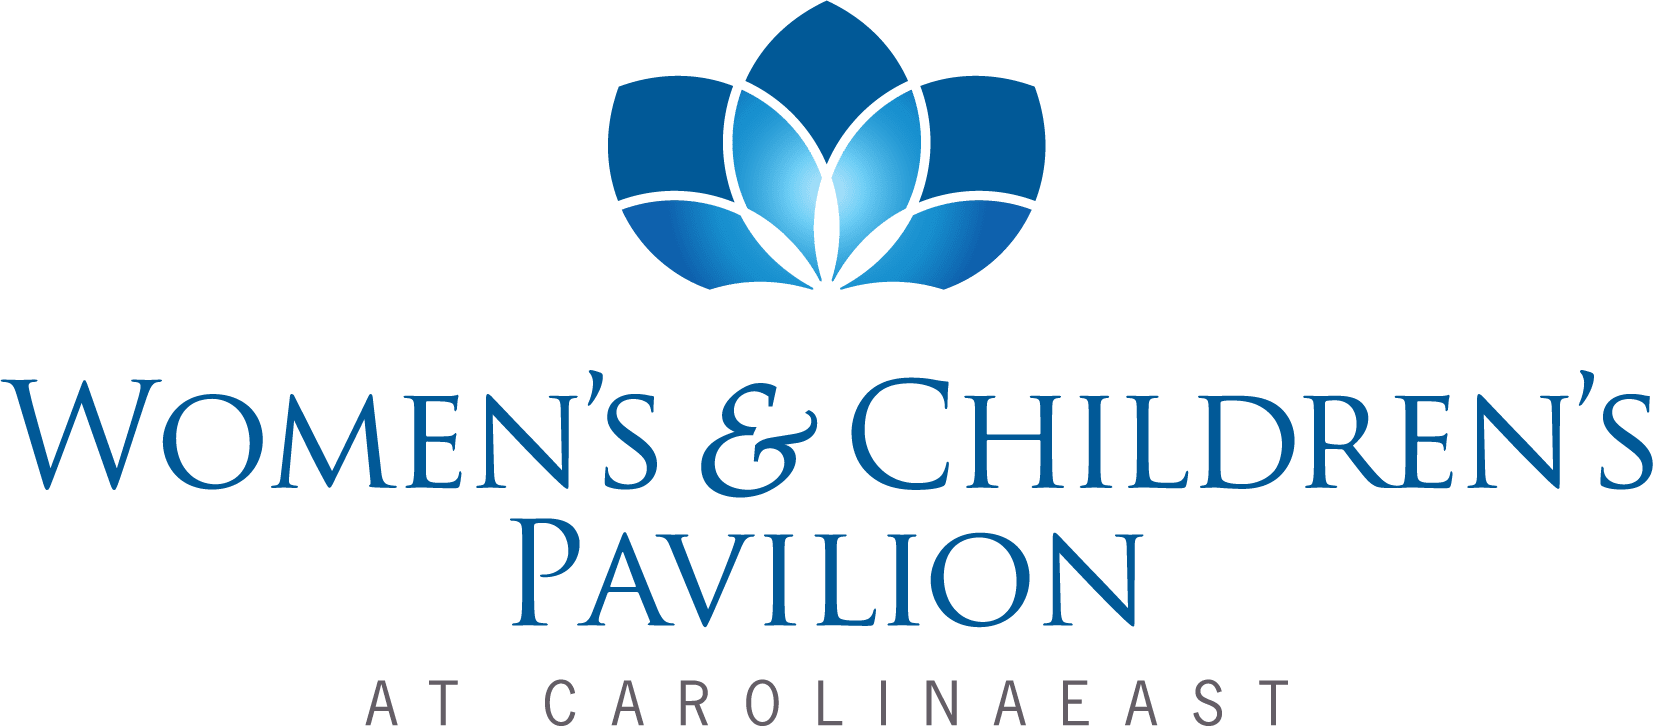 Women's & Children's Pavilion logo | Birthing Center in NC